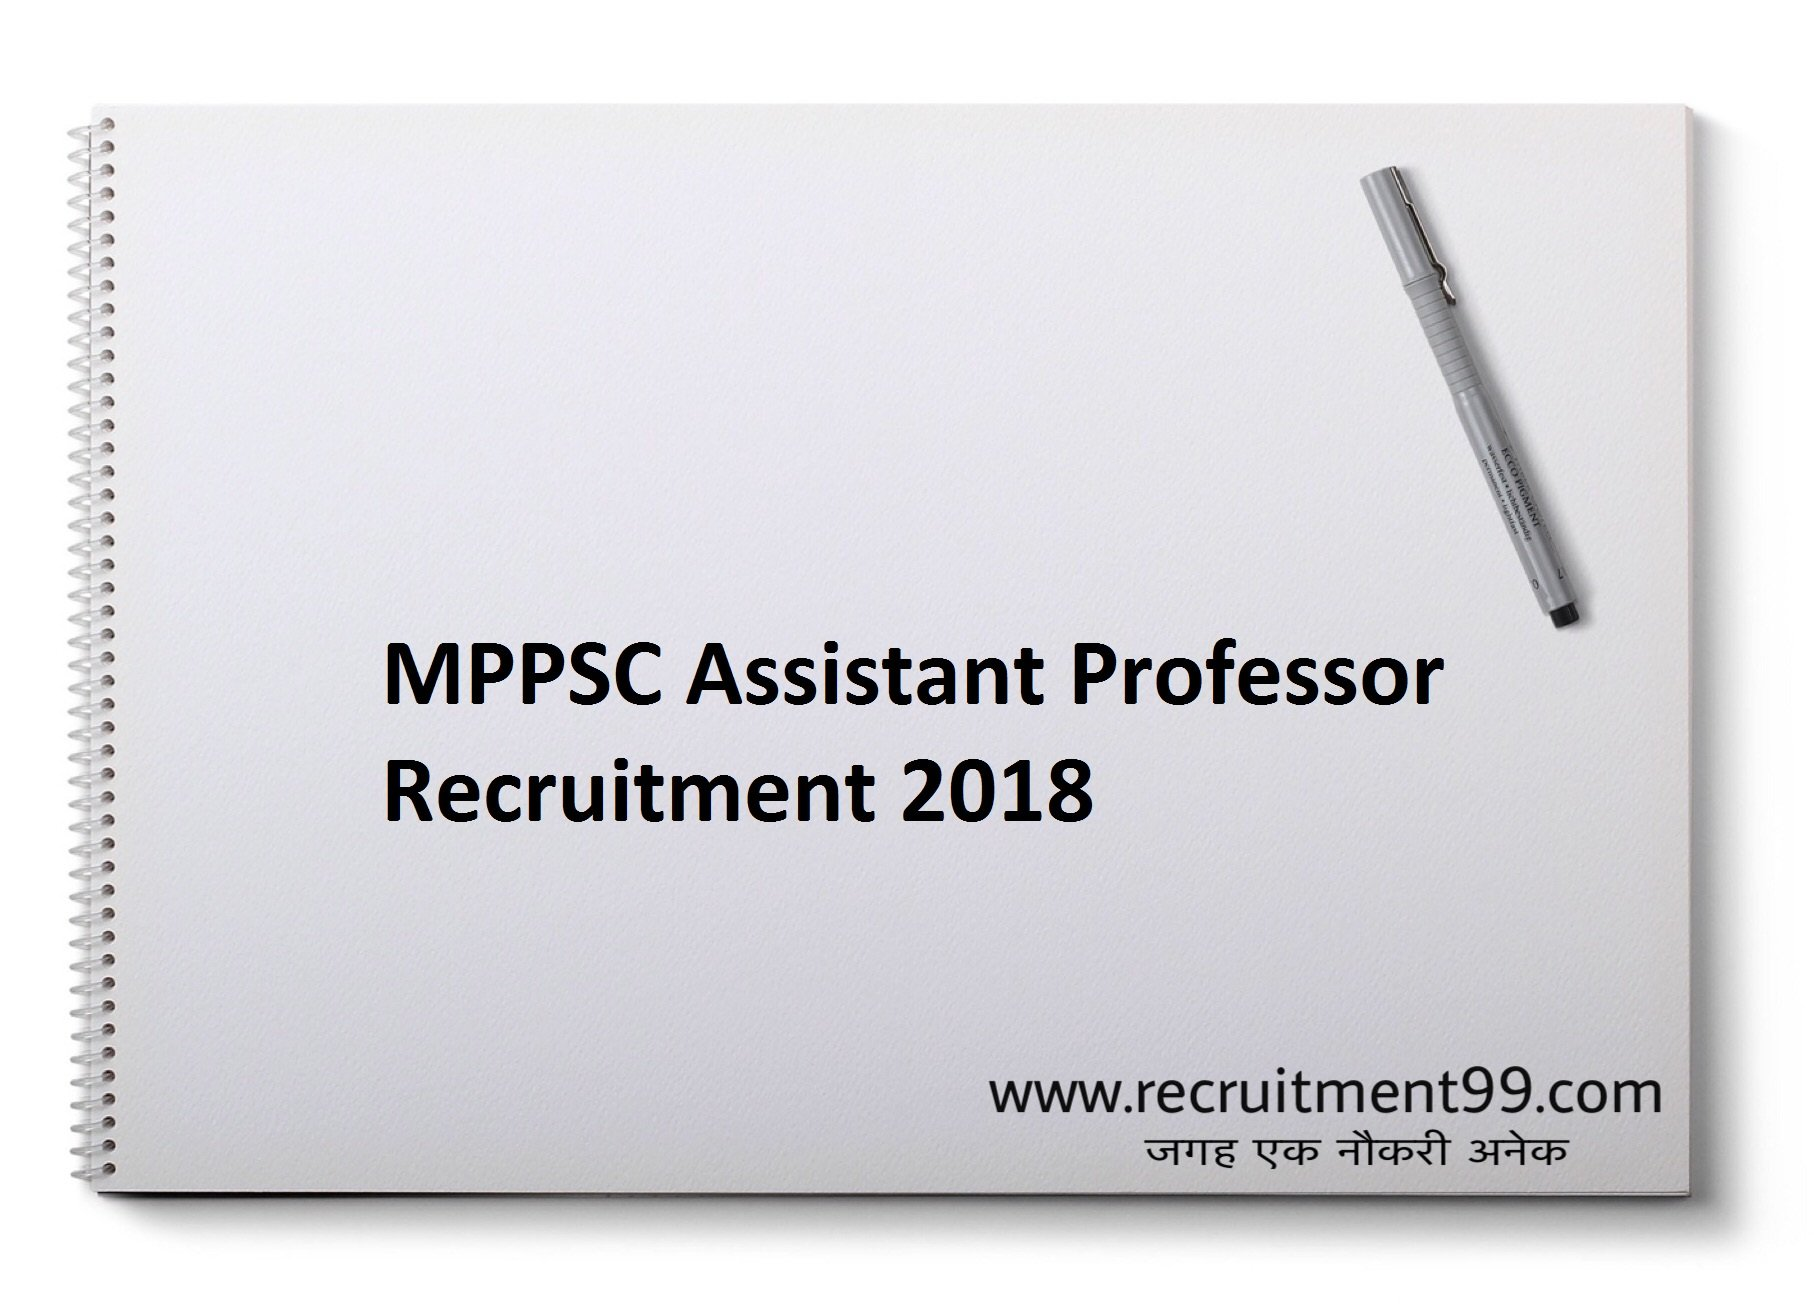 MPPSC Assistant Professor Recruitment Admit Card Result 2018